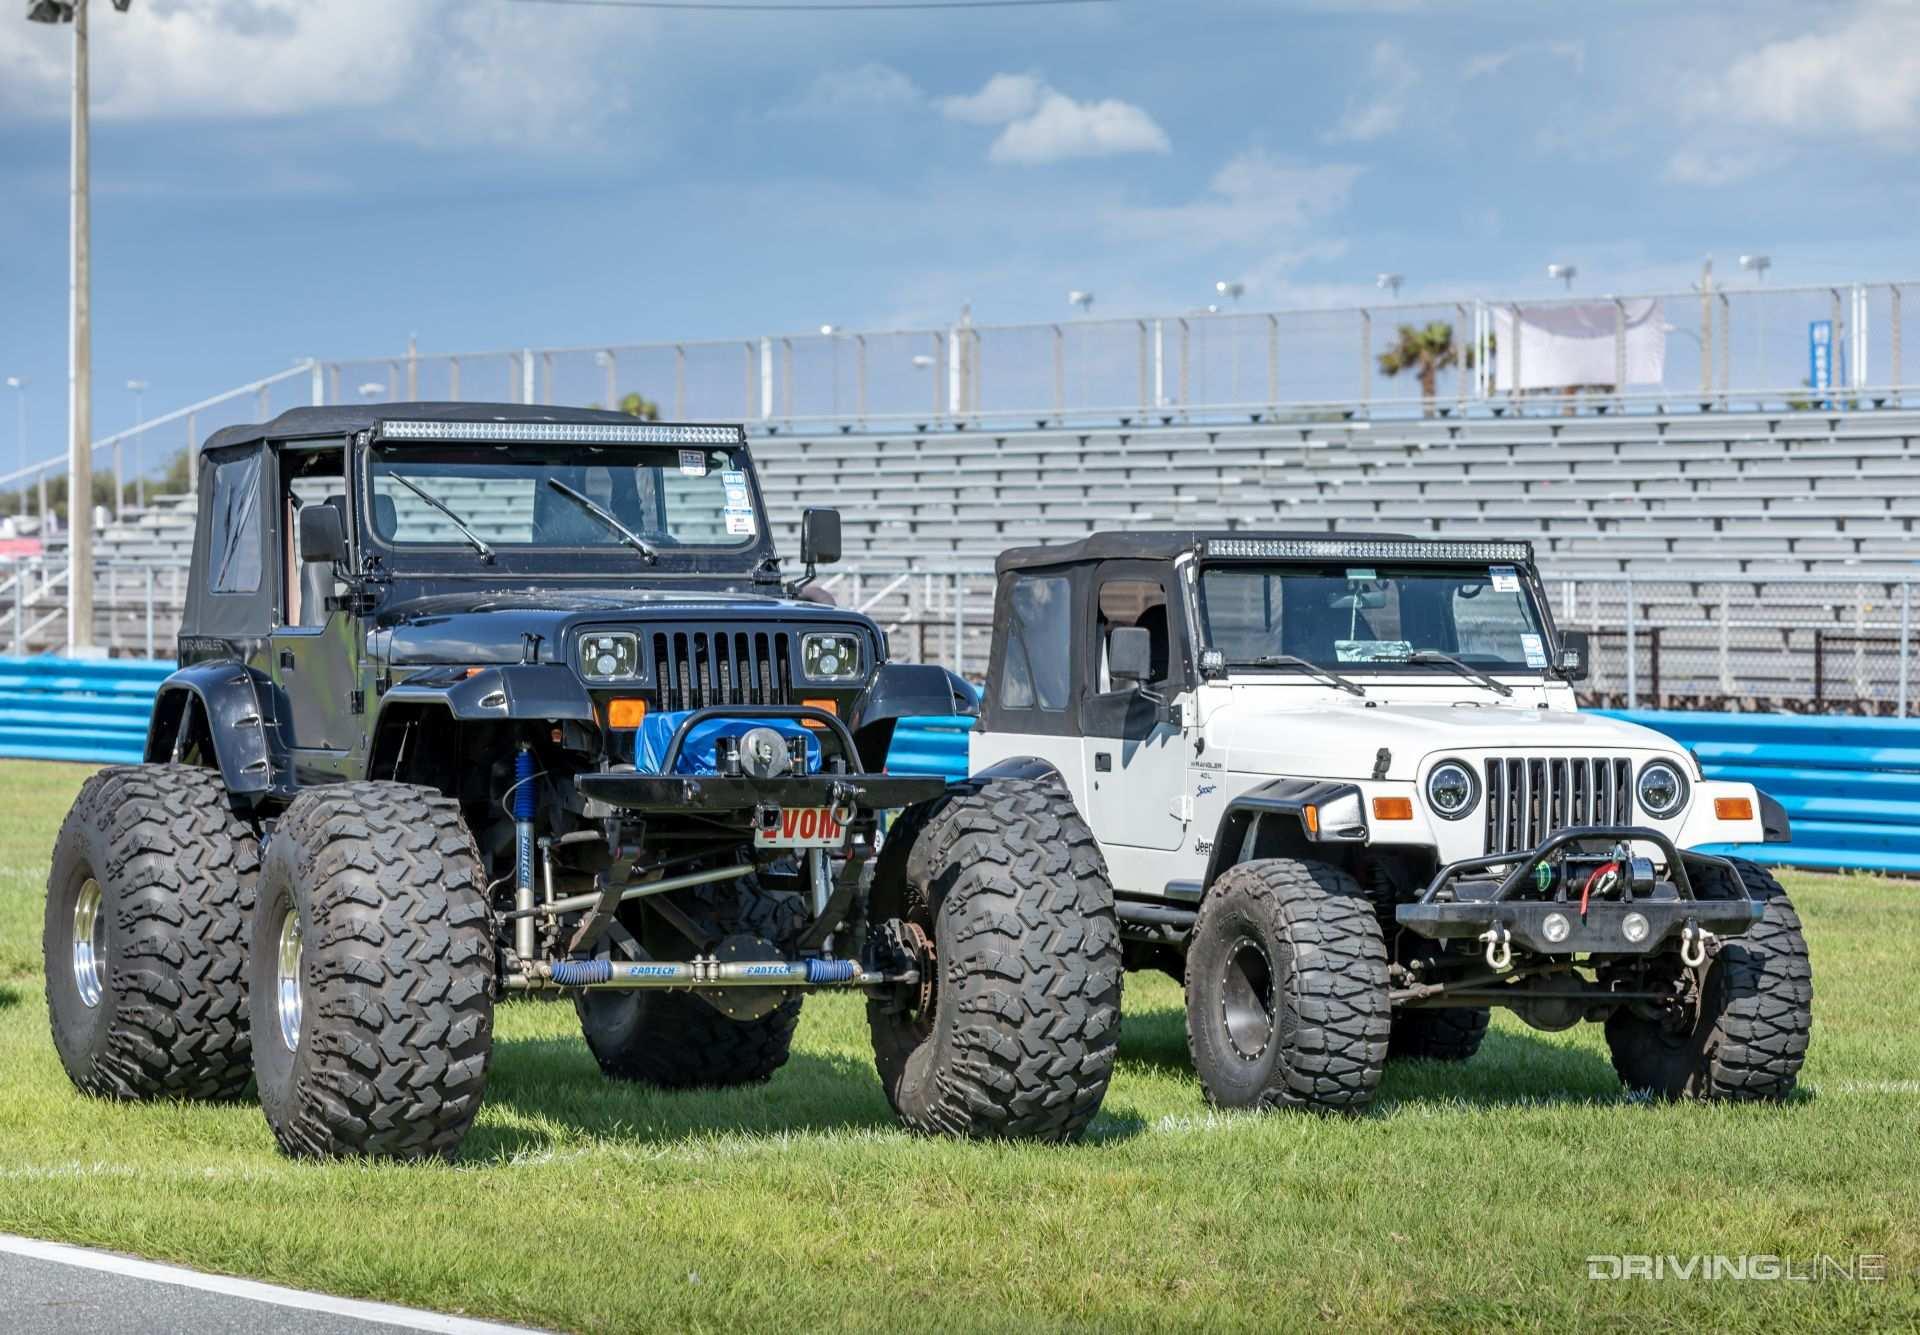 91 New Jeep Beach Daytona 2020 Interior with Jeep Beach Daytona 2020